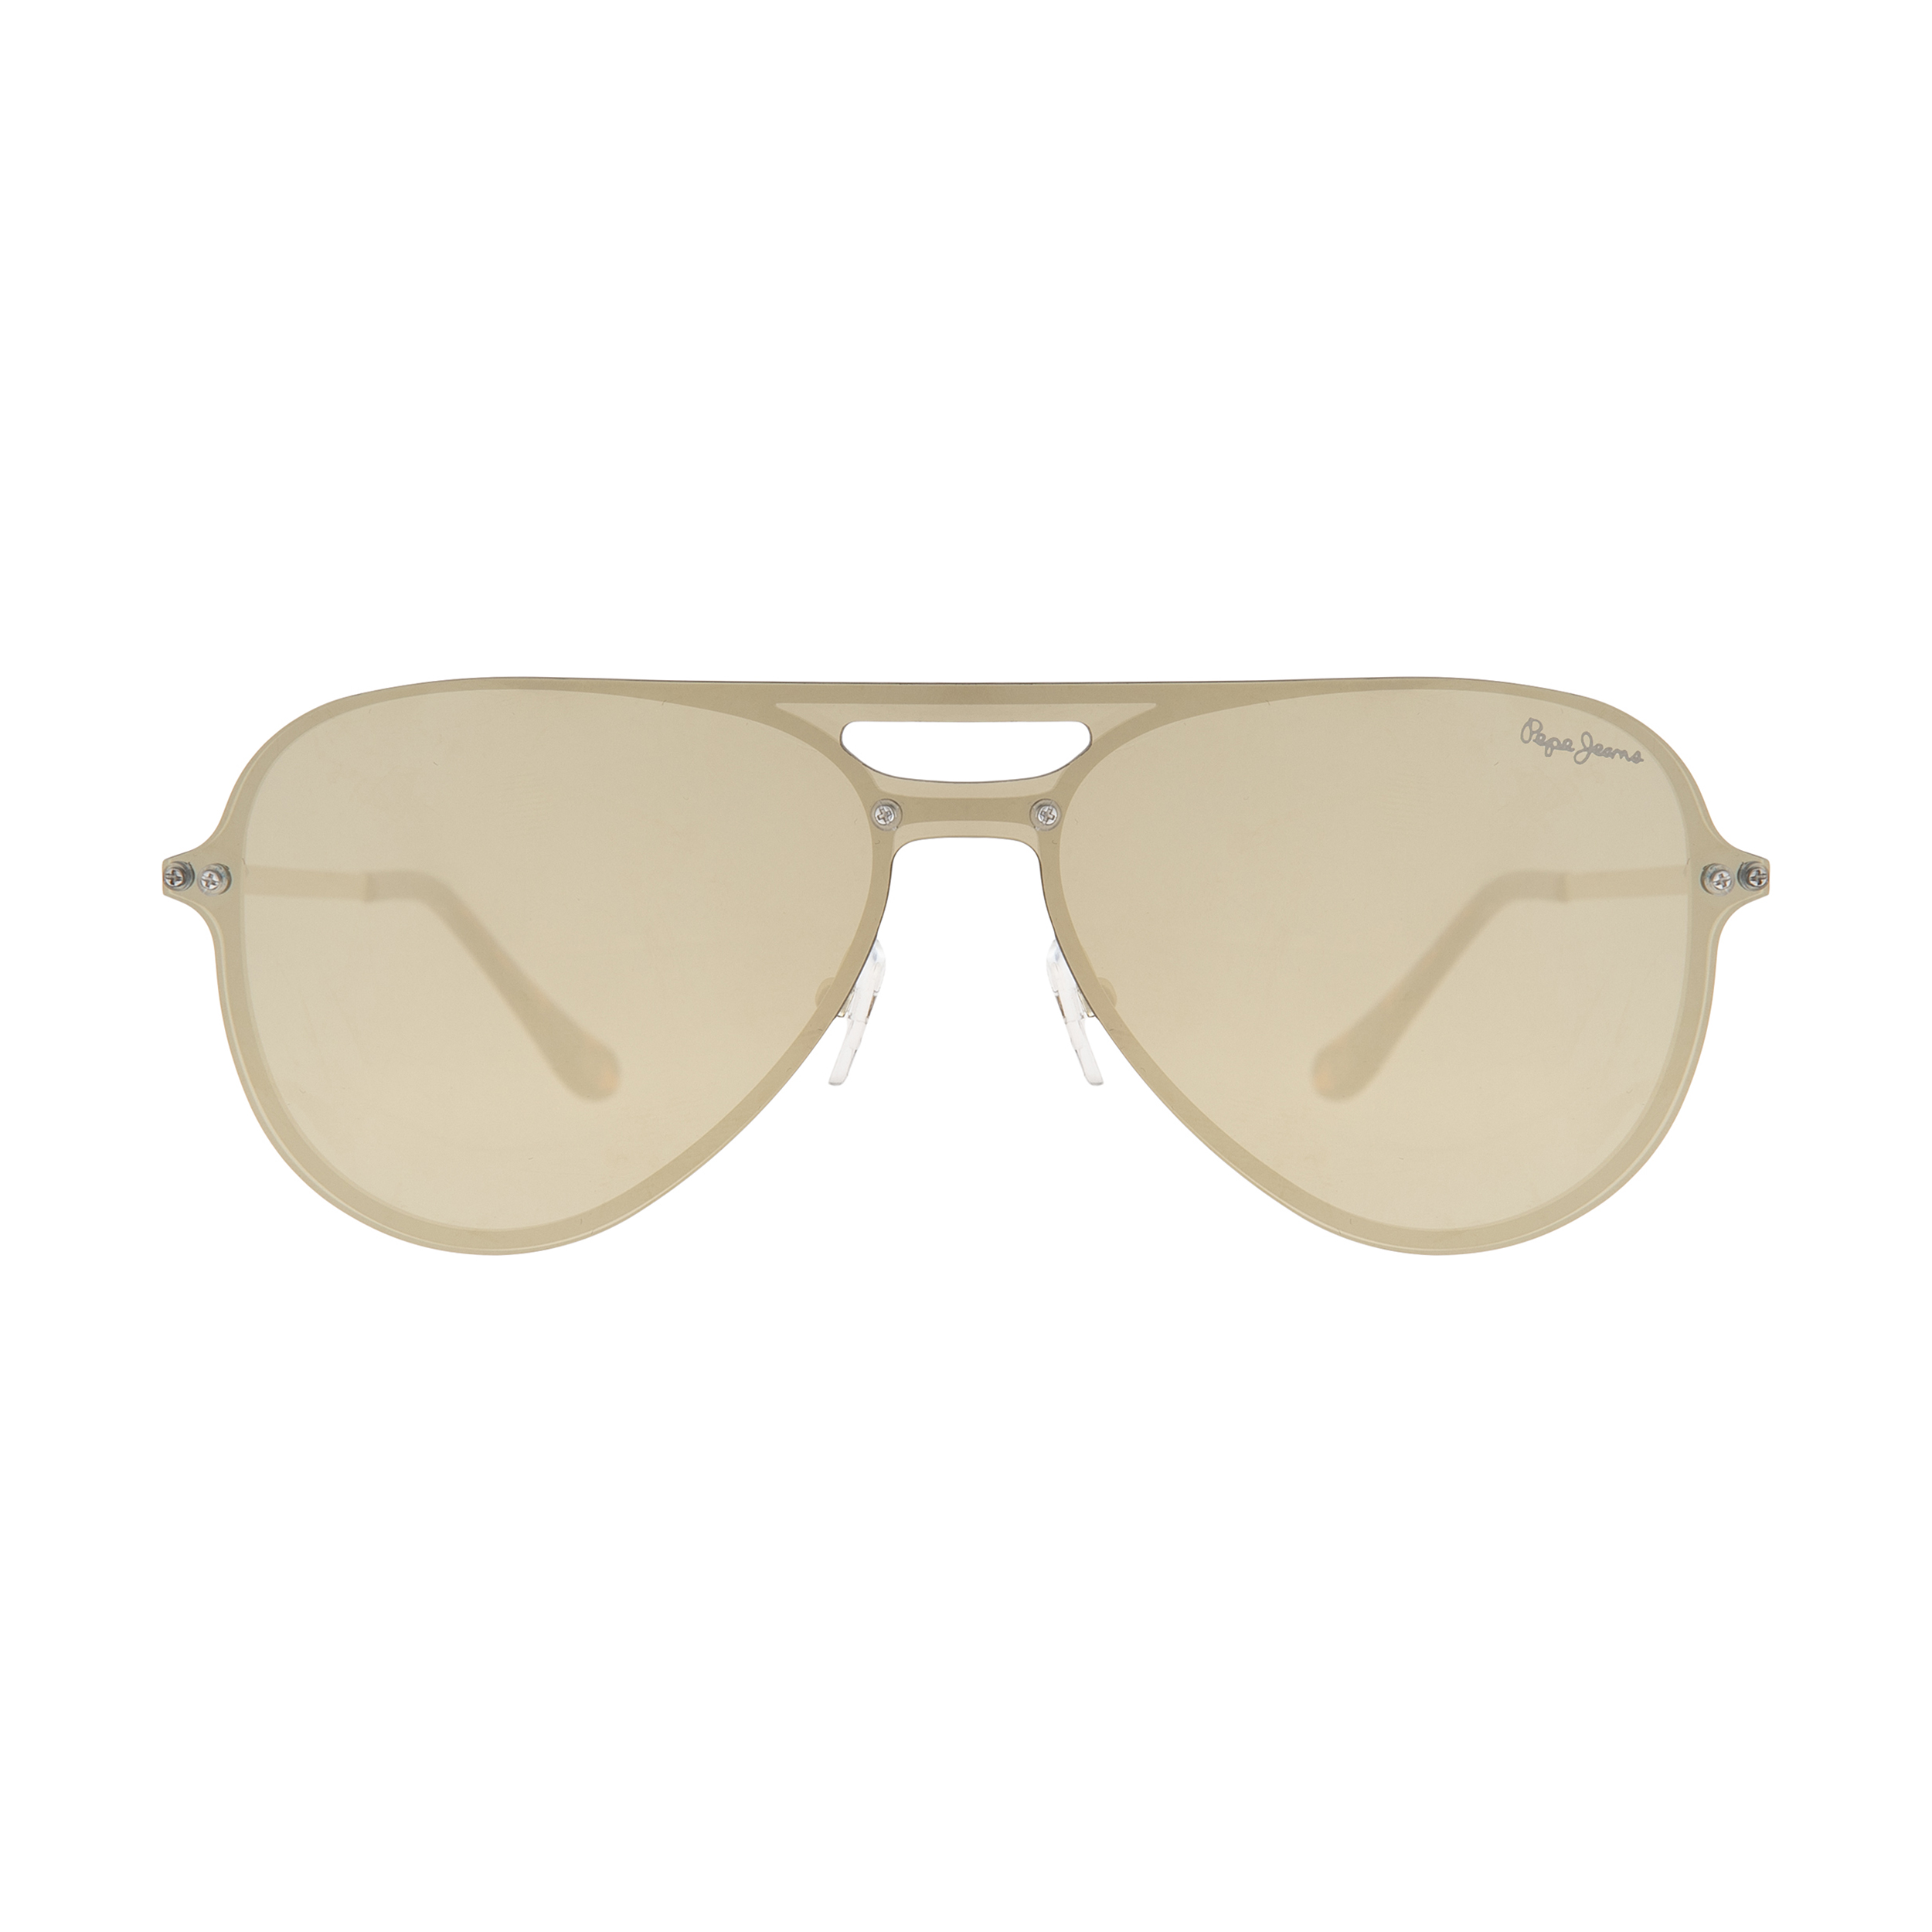 عینک آفتابی پپه جینز مدل PJ 5132 C2